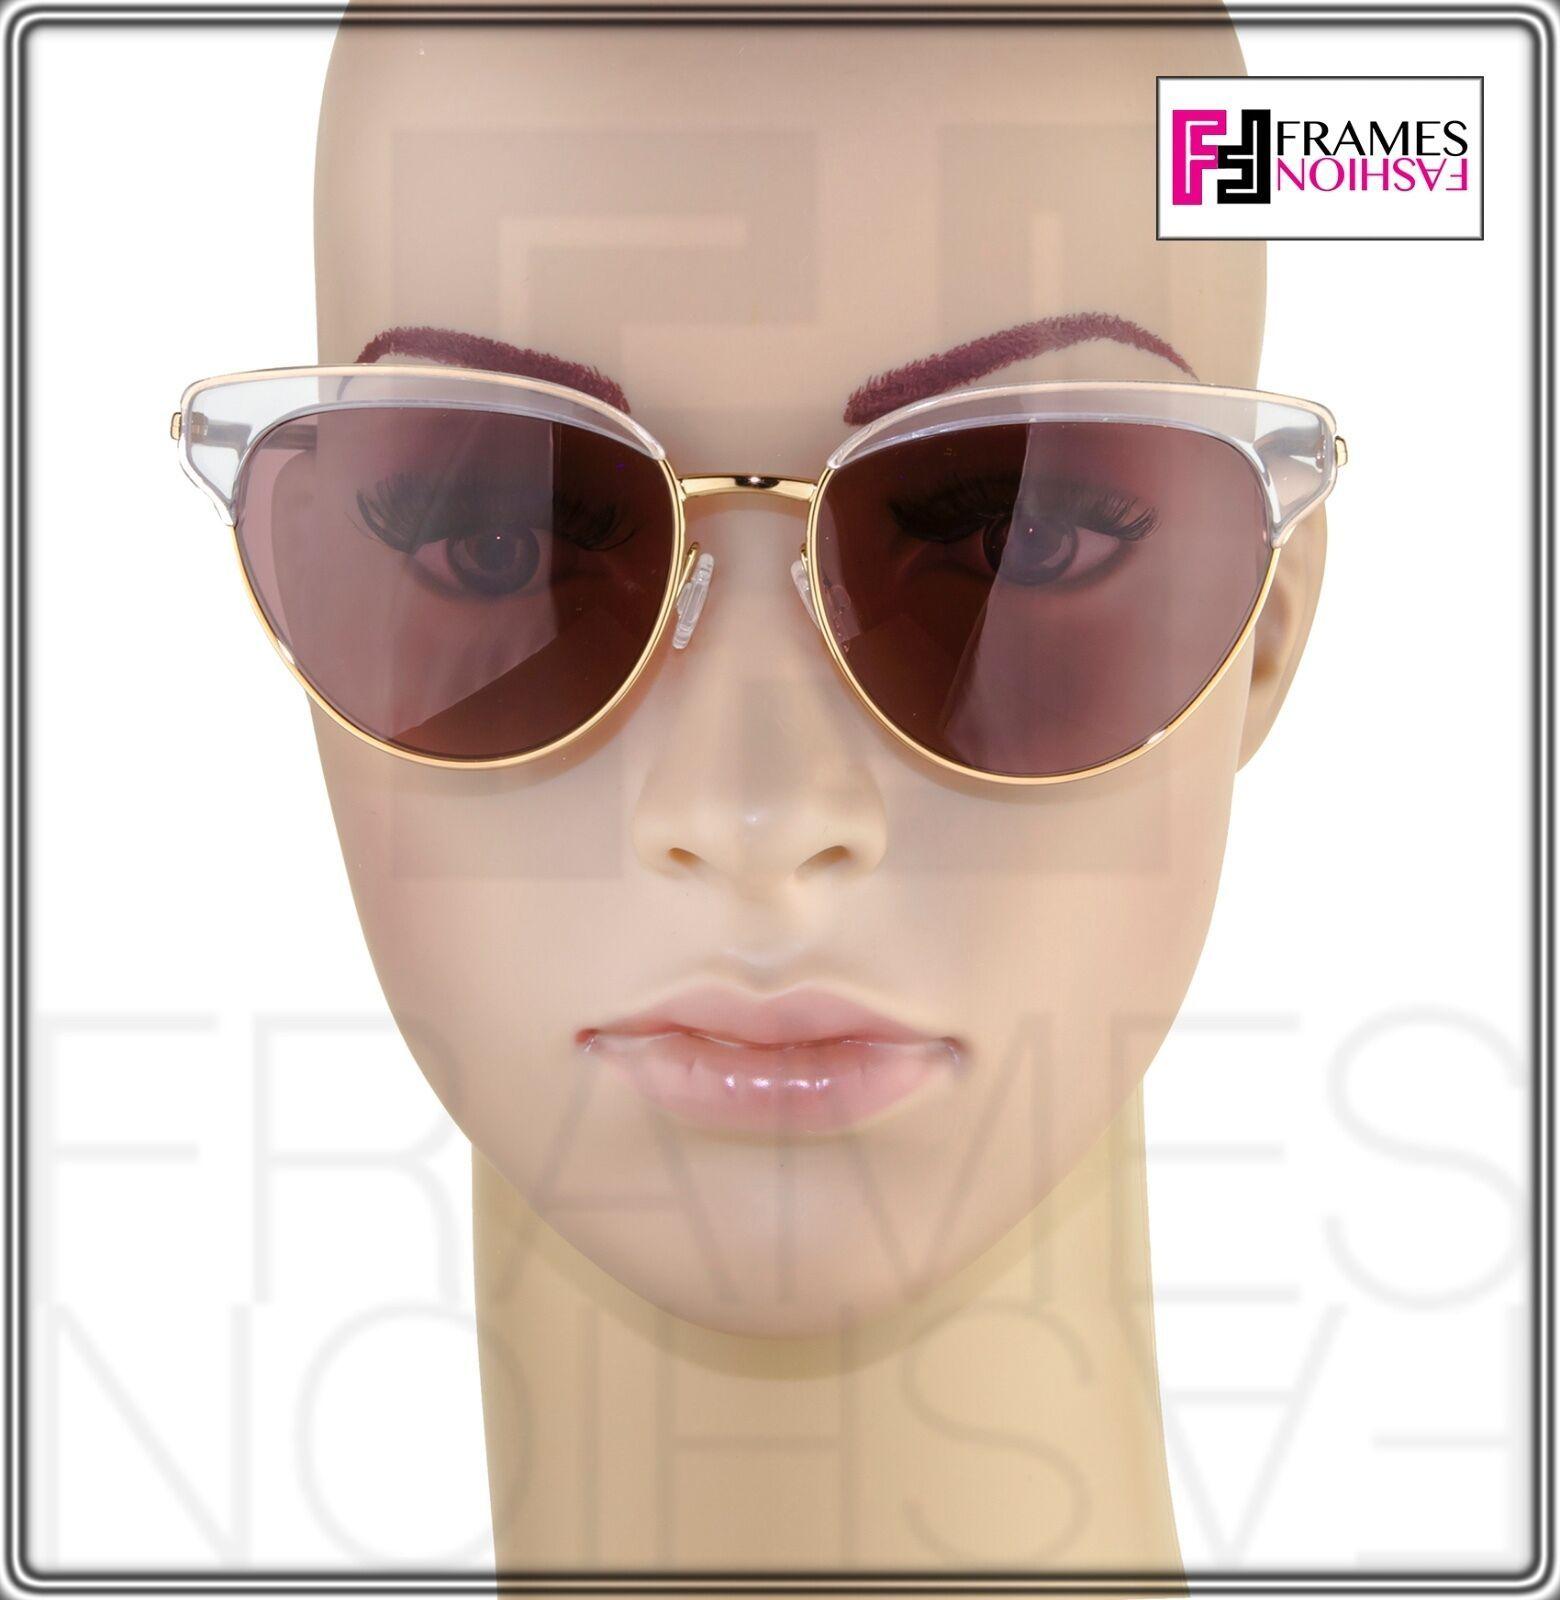 OLIVER PEOPLES JOSA OV1187S Rose Gold Pink Crystal Cat Eye Sunglasses 1187 image 3